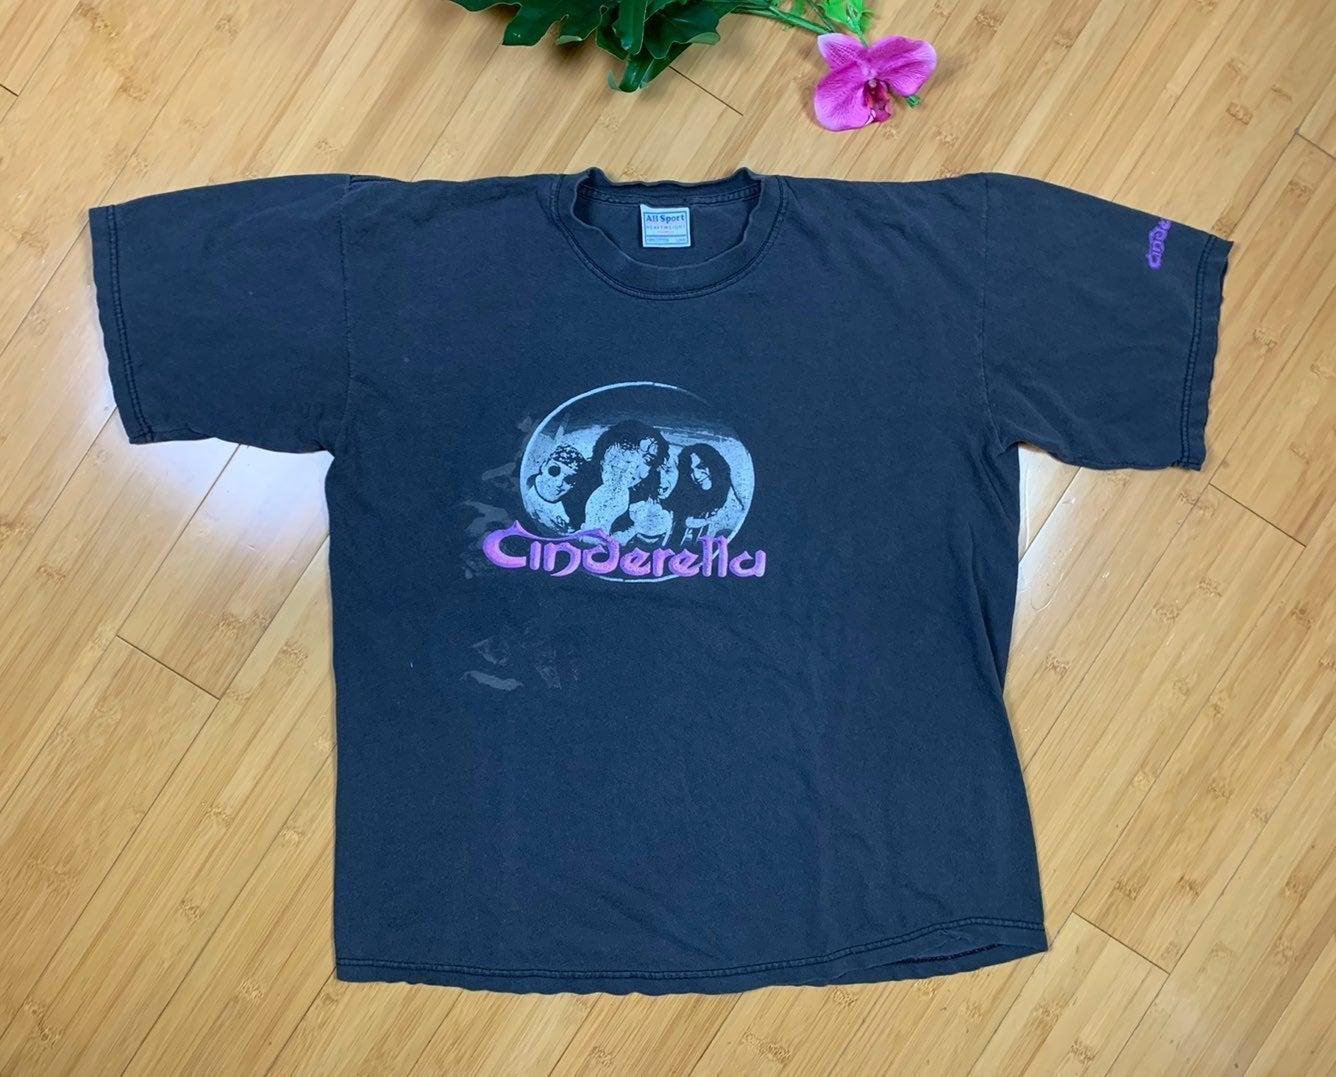 Cinderella concert t shirt